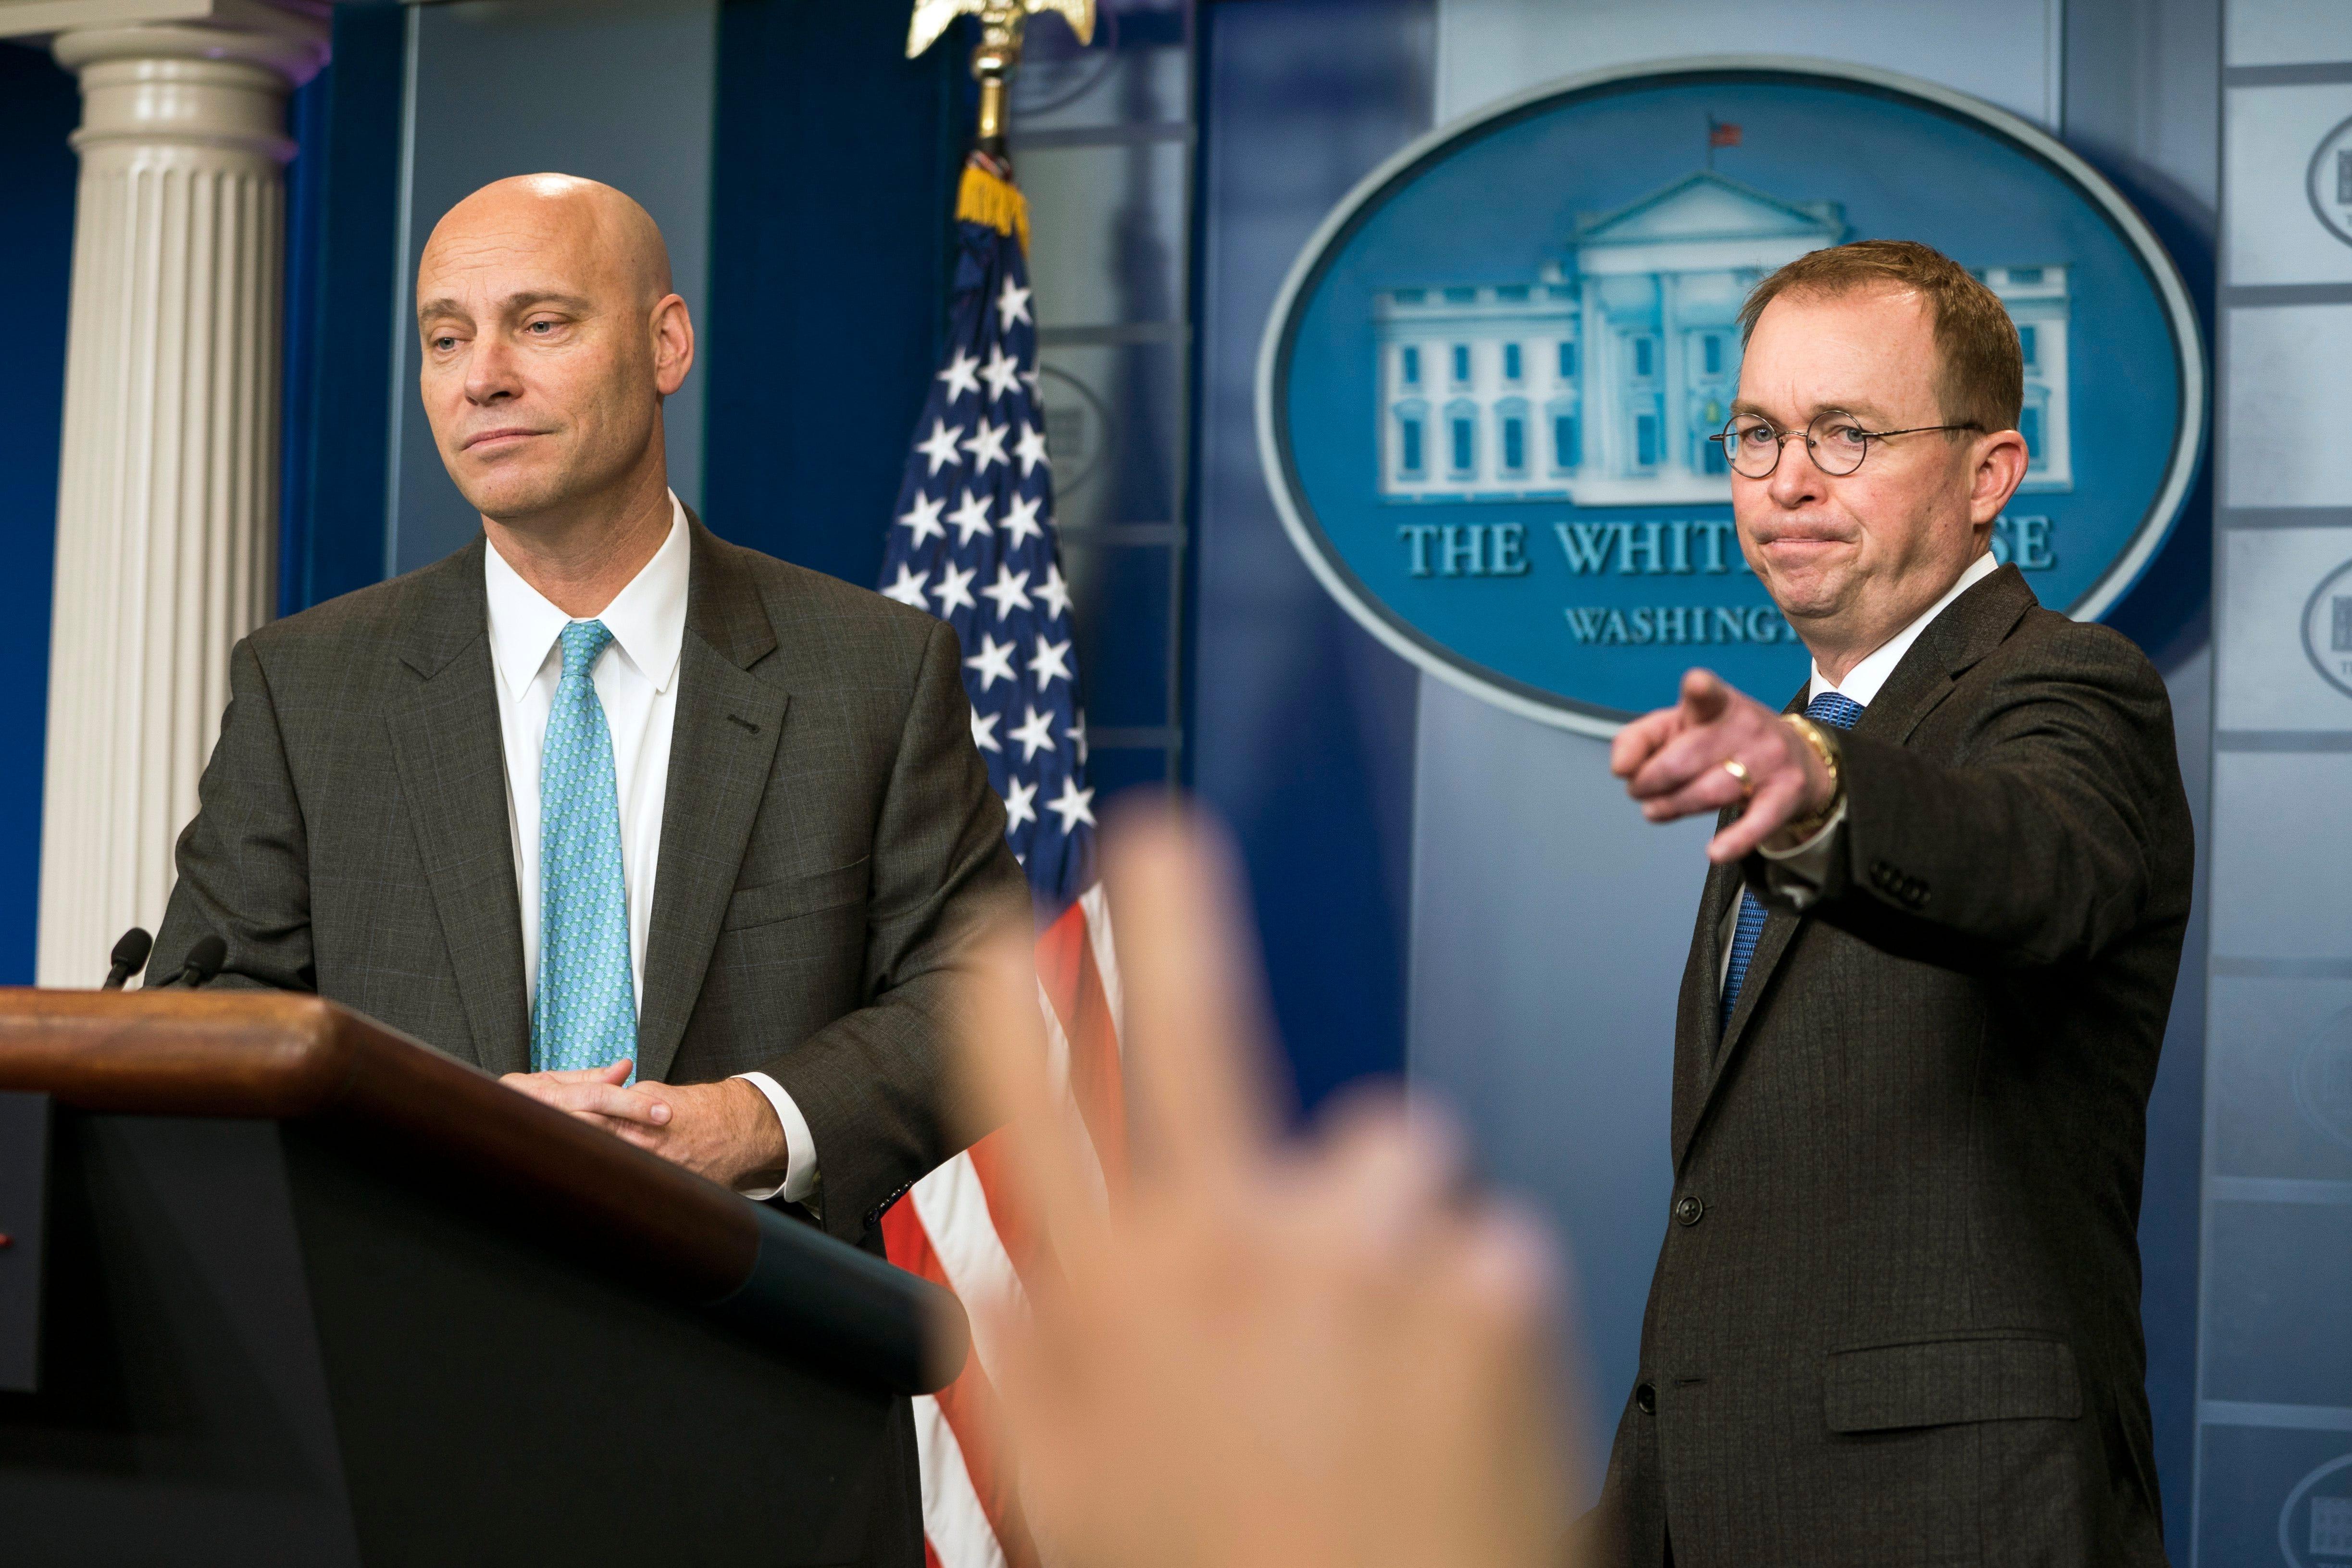 White House: This shutdown won't be like previous shutdowns